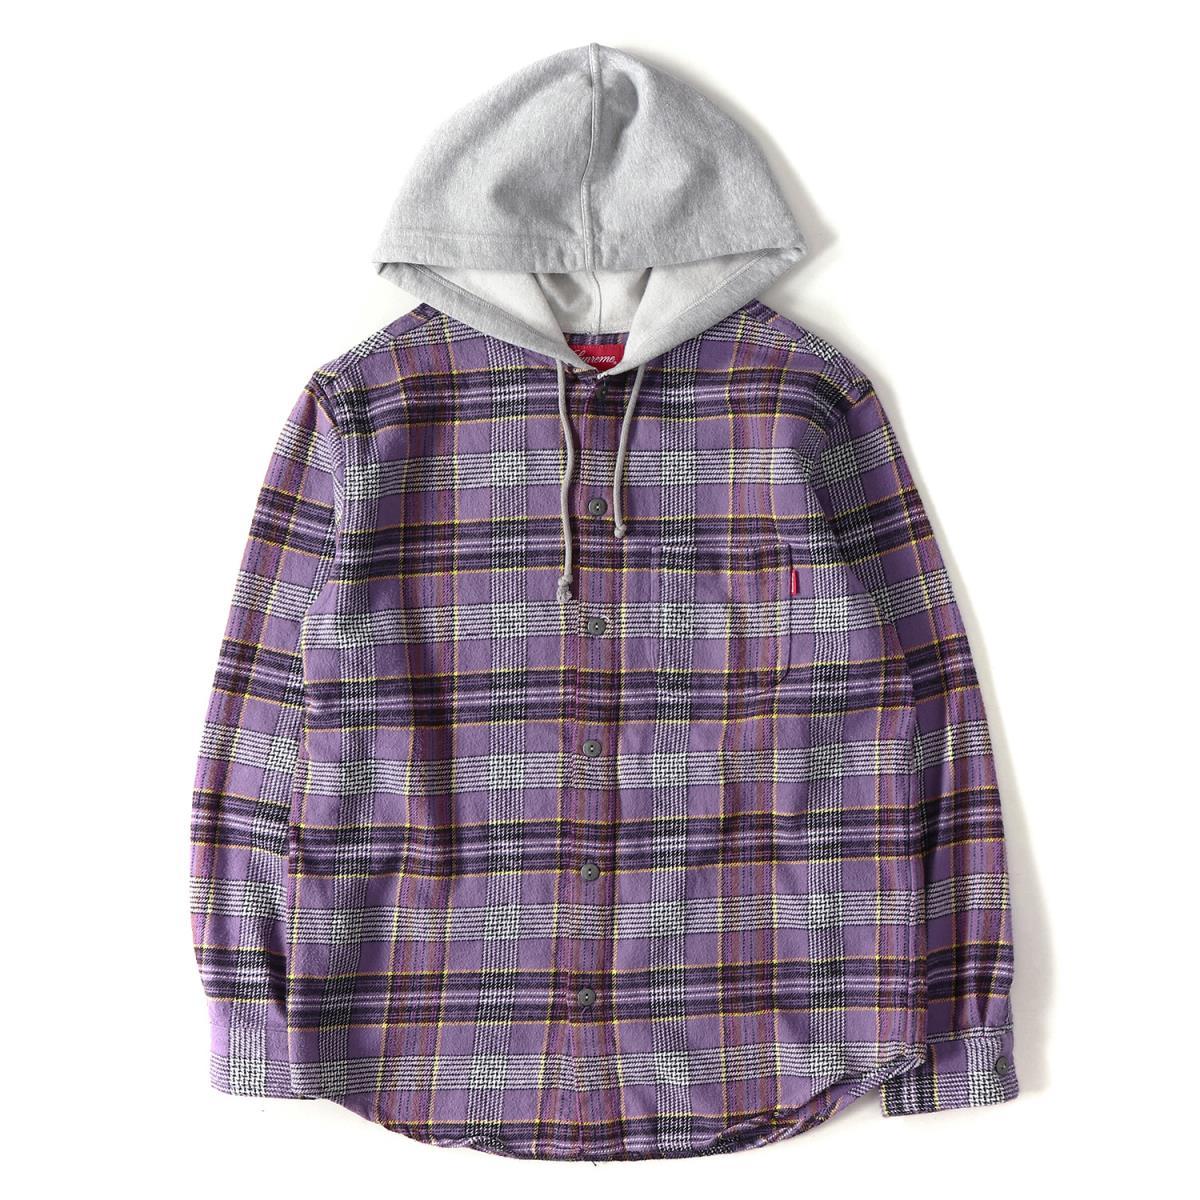 Supreme (シュプリーム) 18S/S フード付きチェックネルシャツ(Hooded Plaid Flannel Shirt) パープル S 【美品】【メンズ】【K2090】【中古】【あす楽☆対応可】